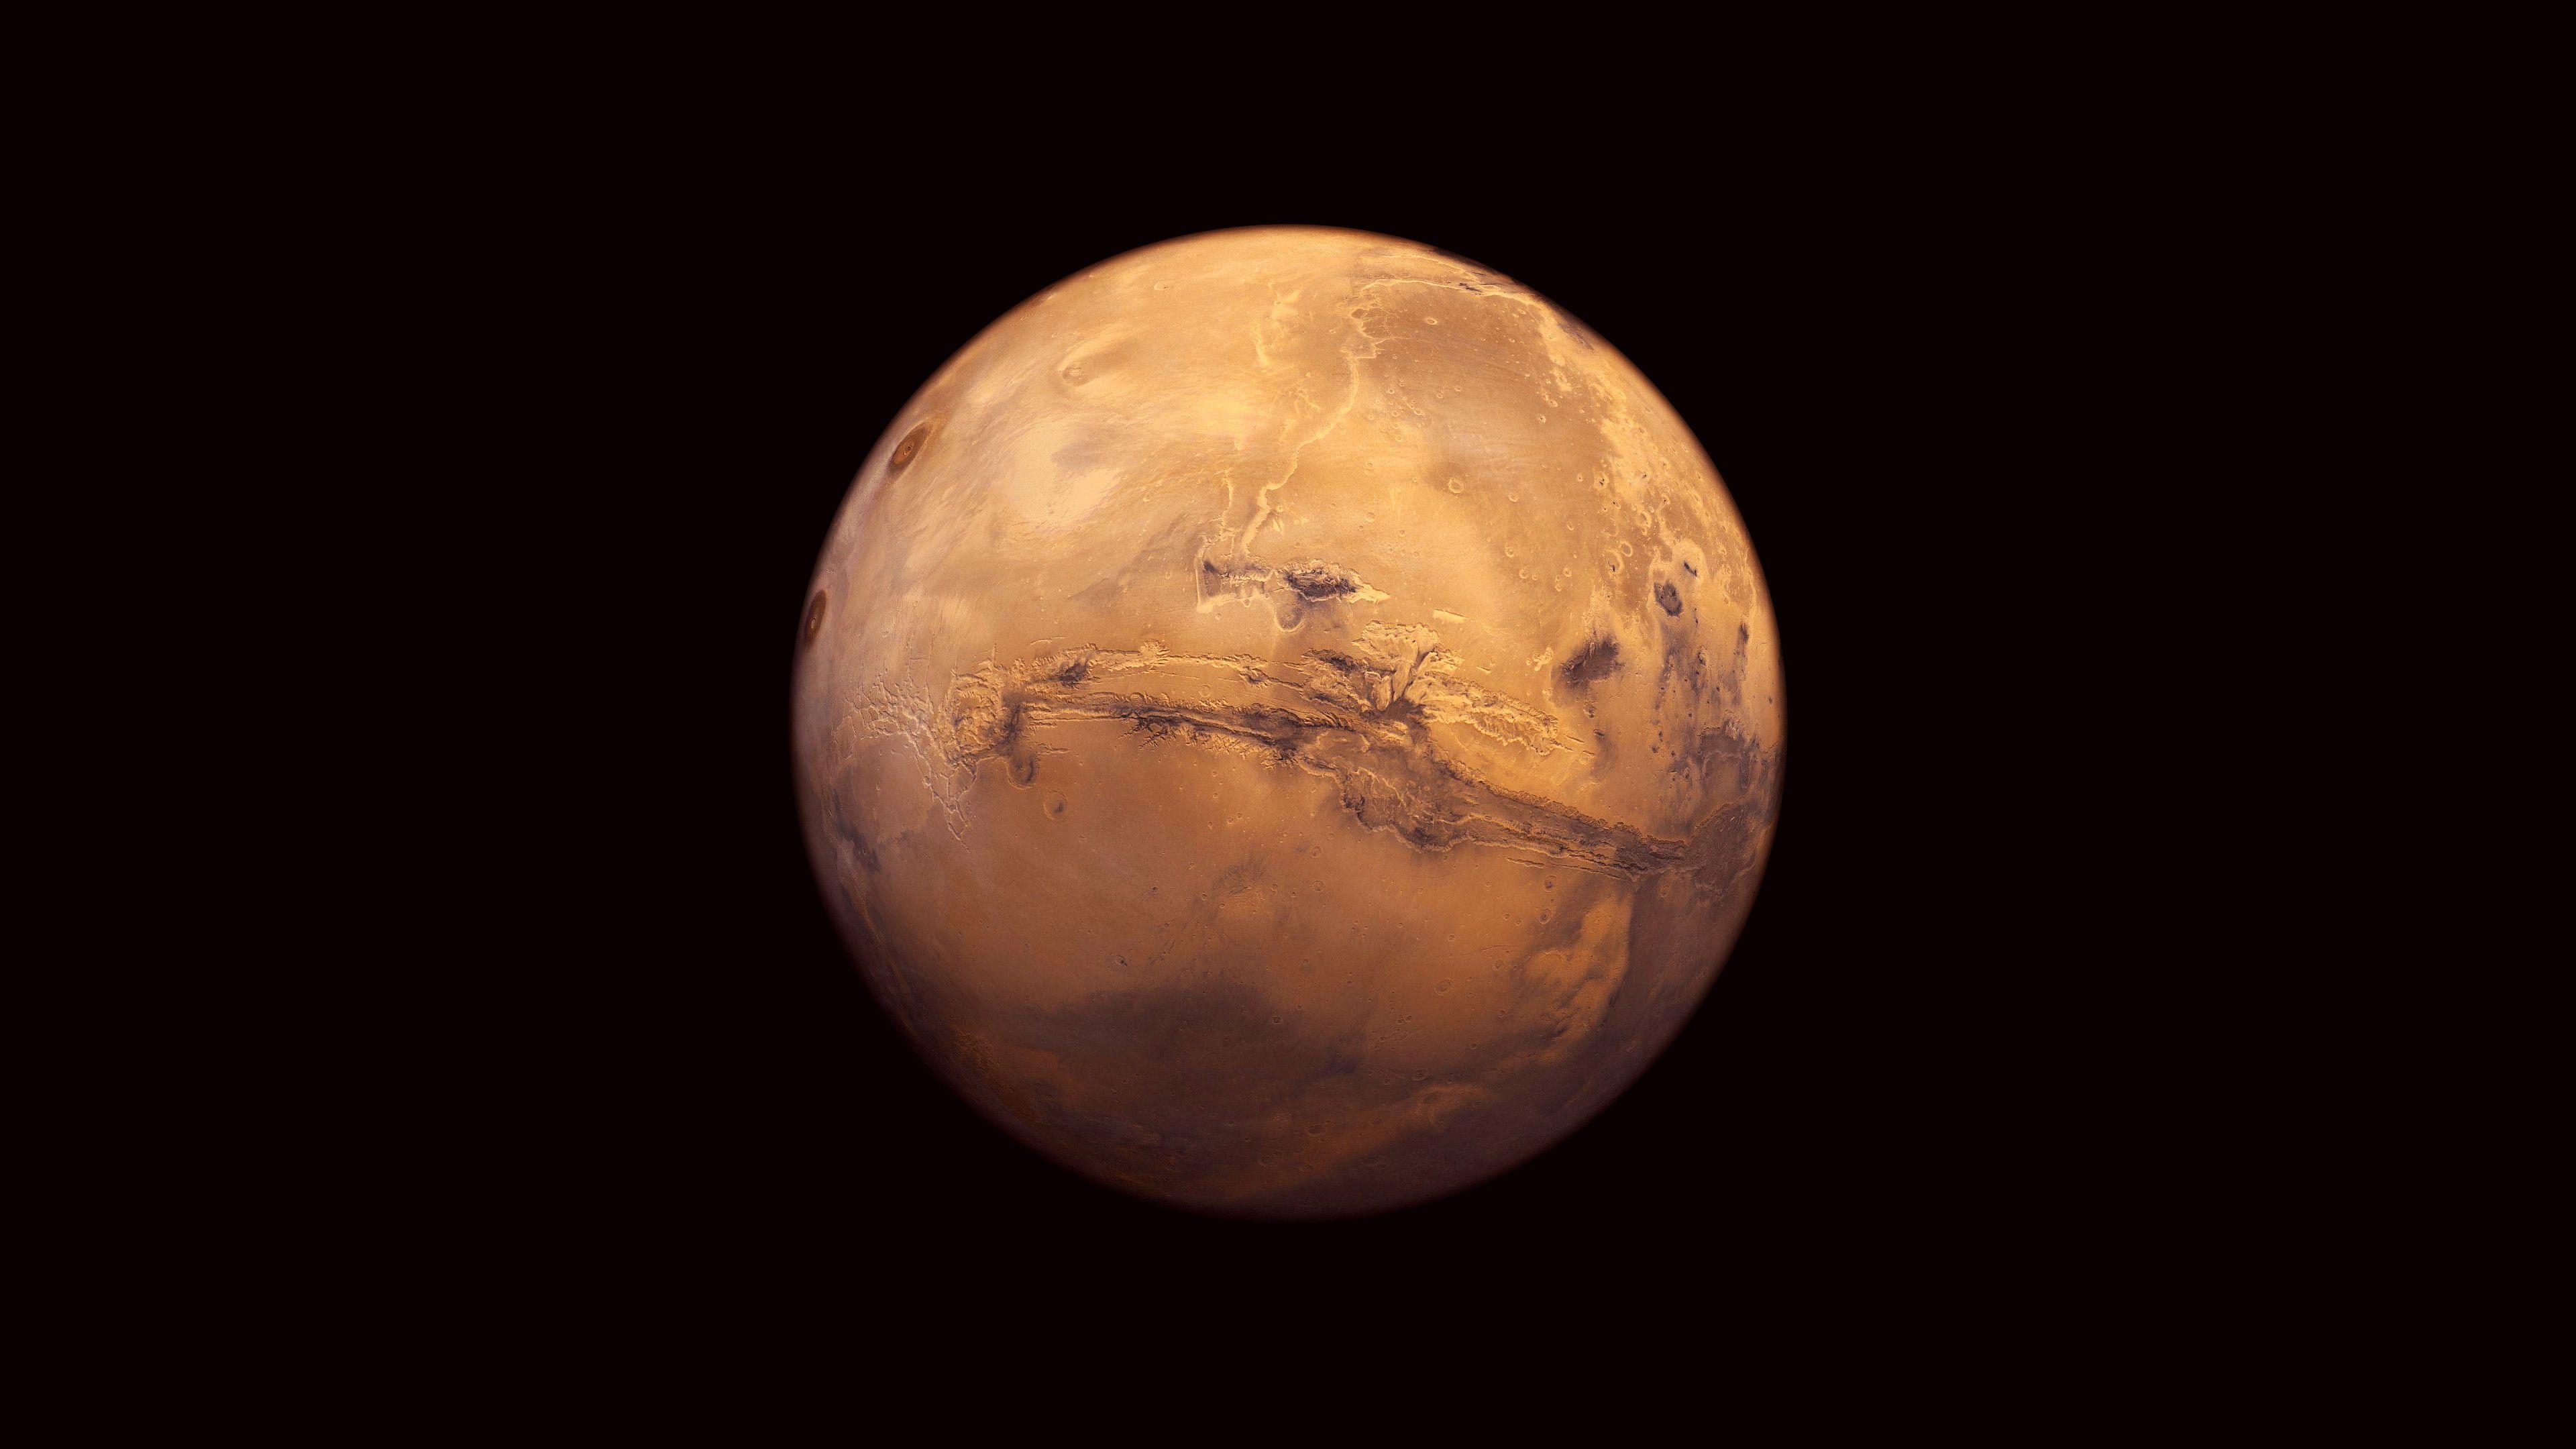 mars-high-resolution-wallpapers-cool-desktop-background-images